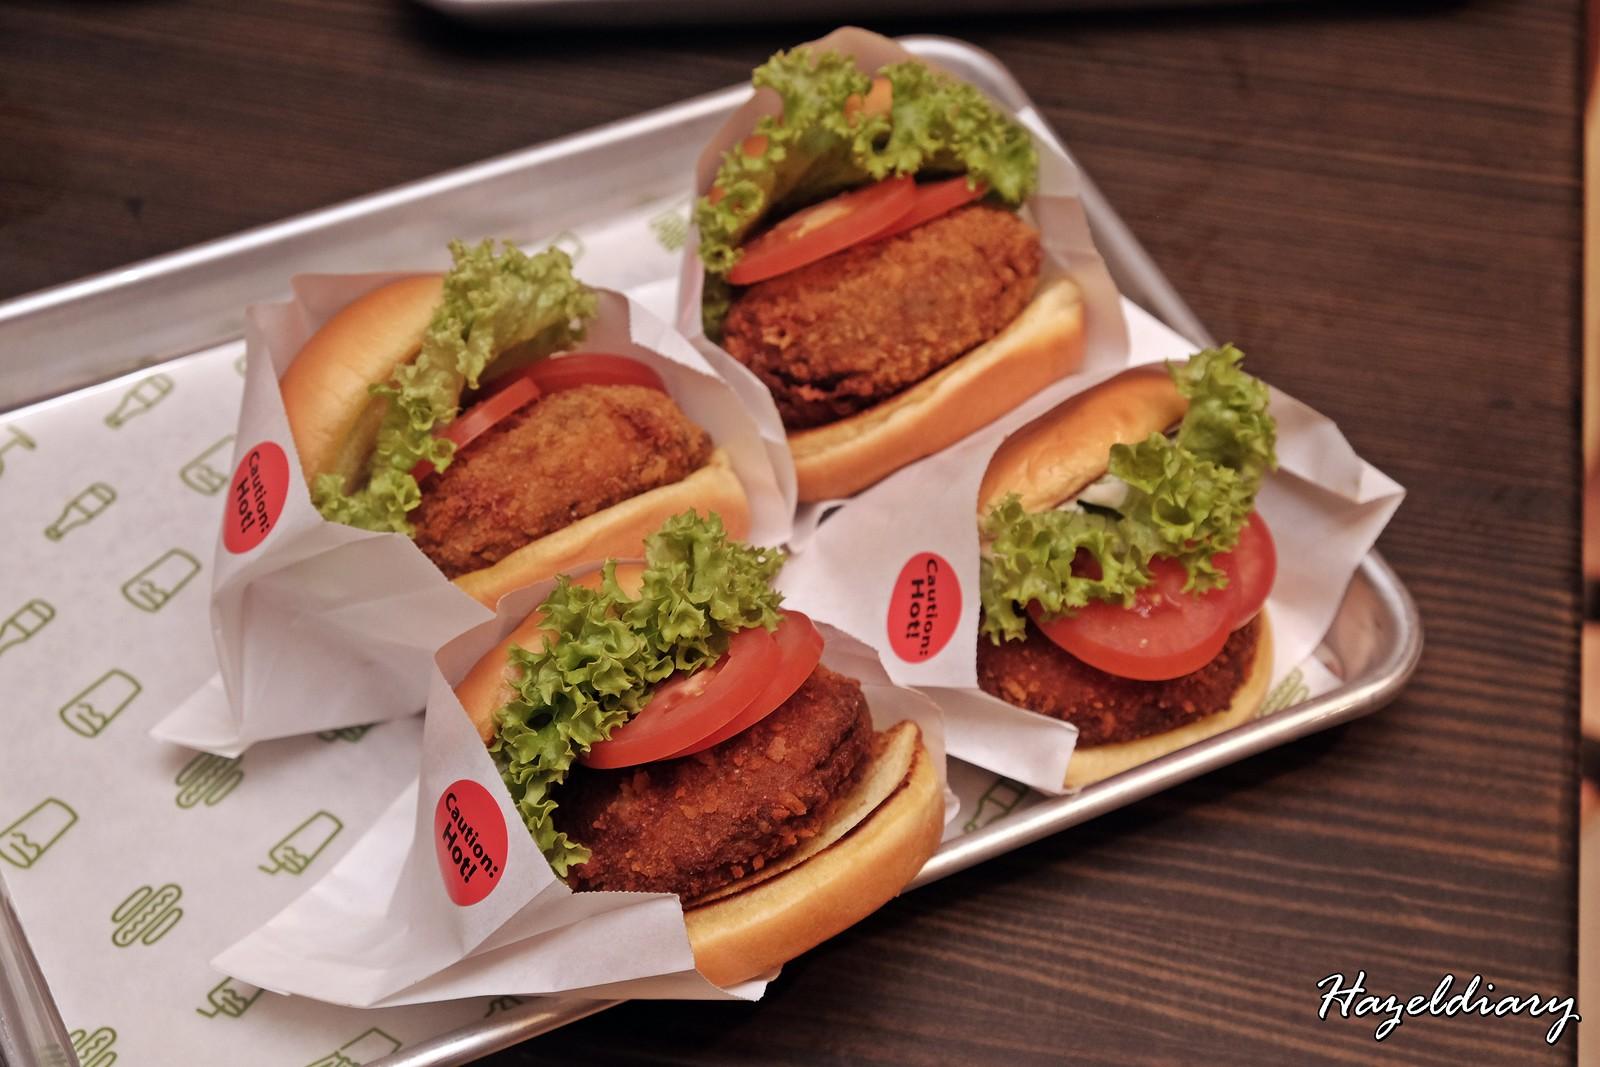 Shack Shack Singapore-Portobello Mushroom Burger